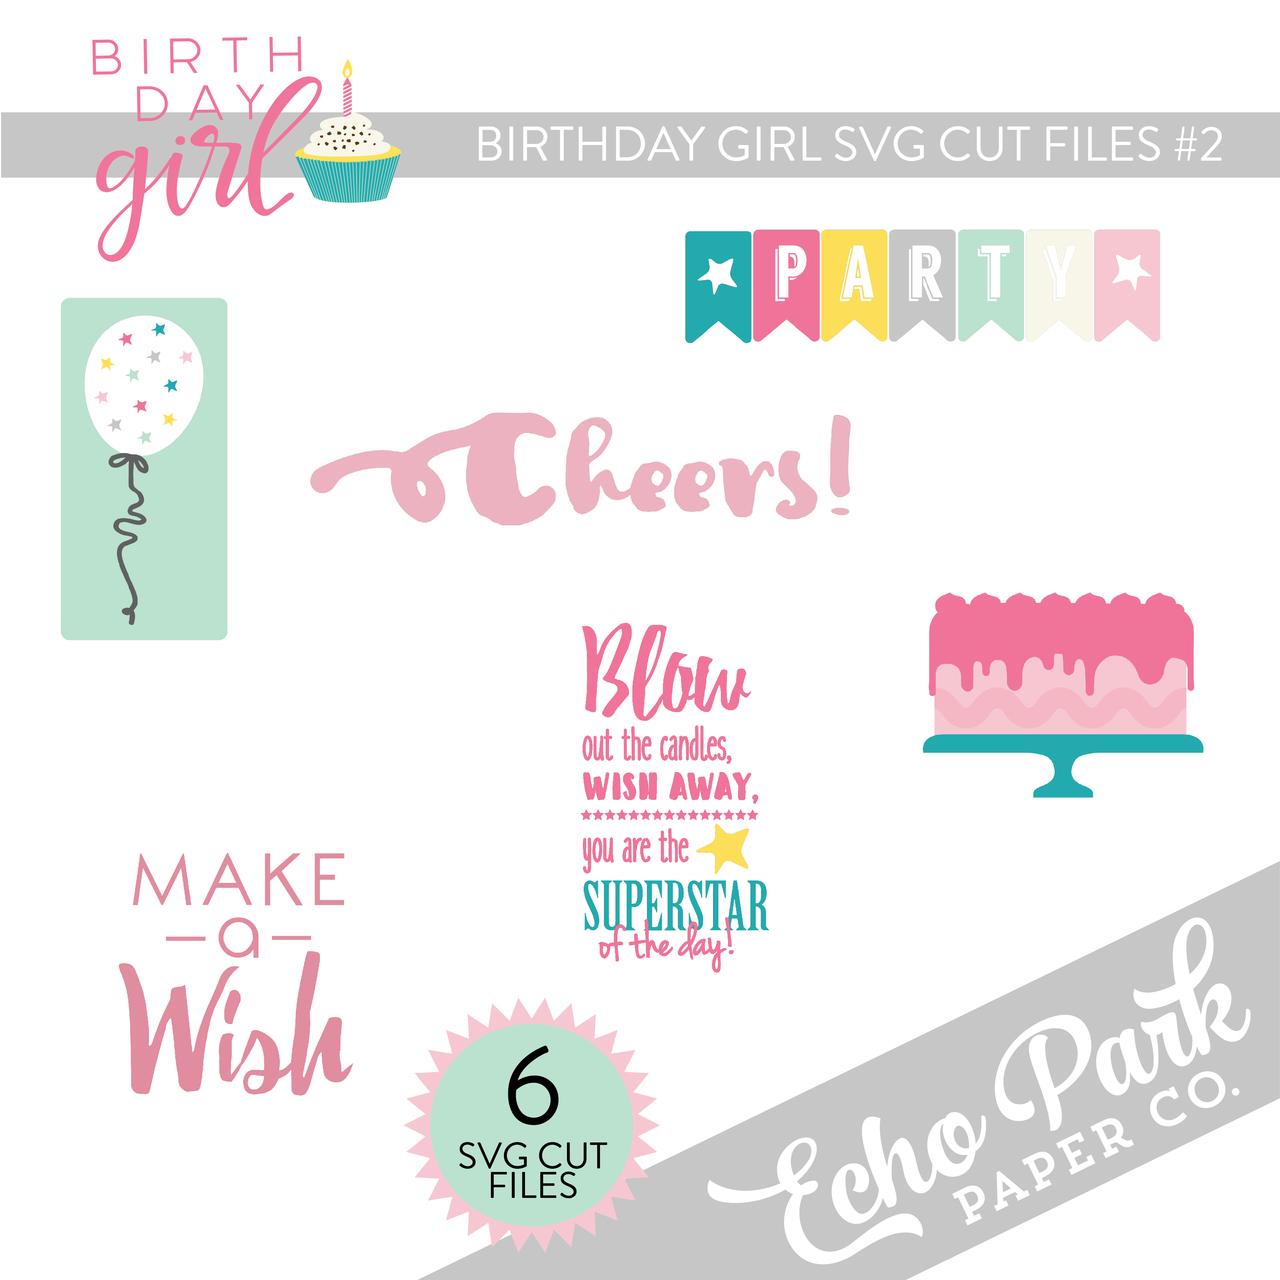 Birthday Girl SVG Cut Files #2